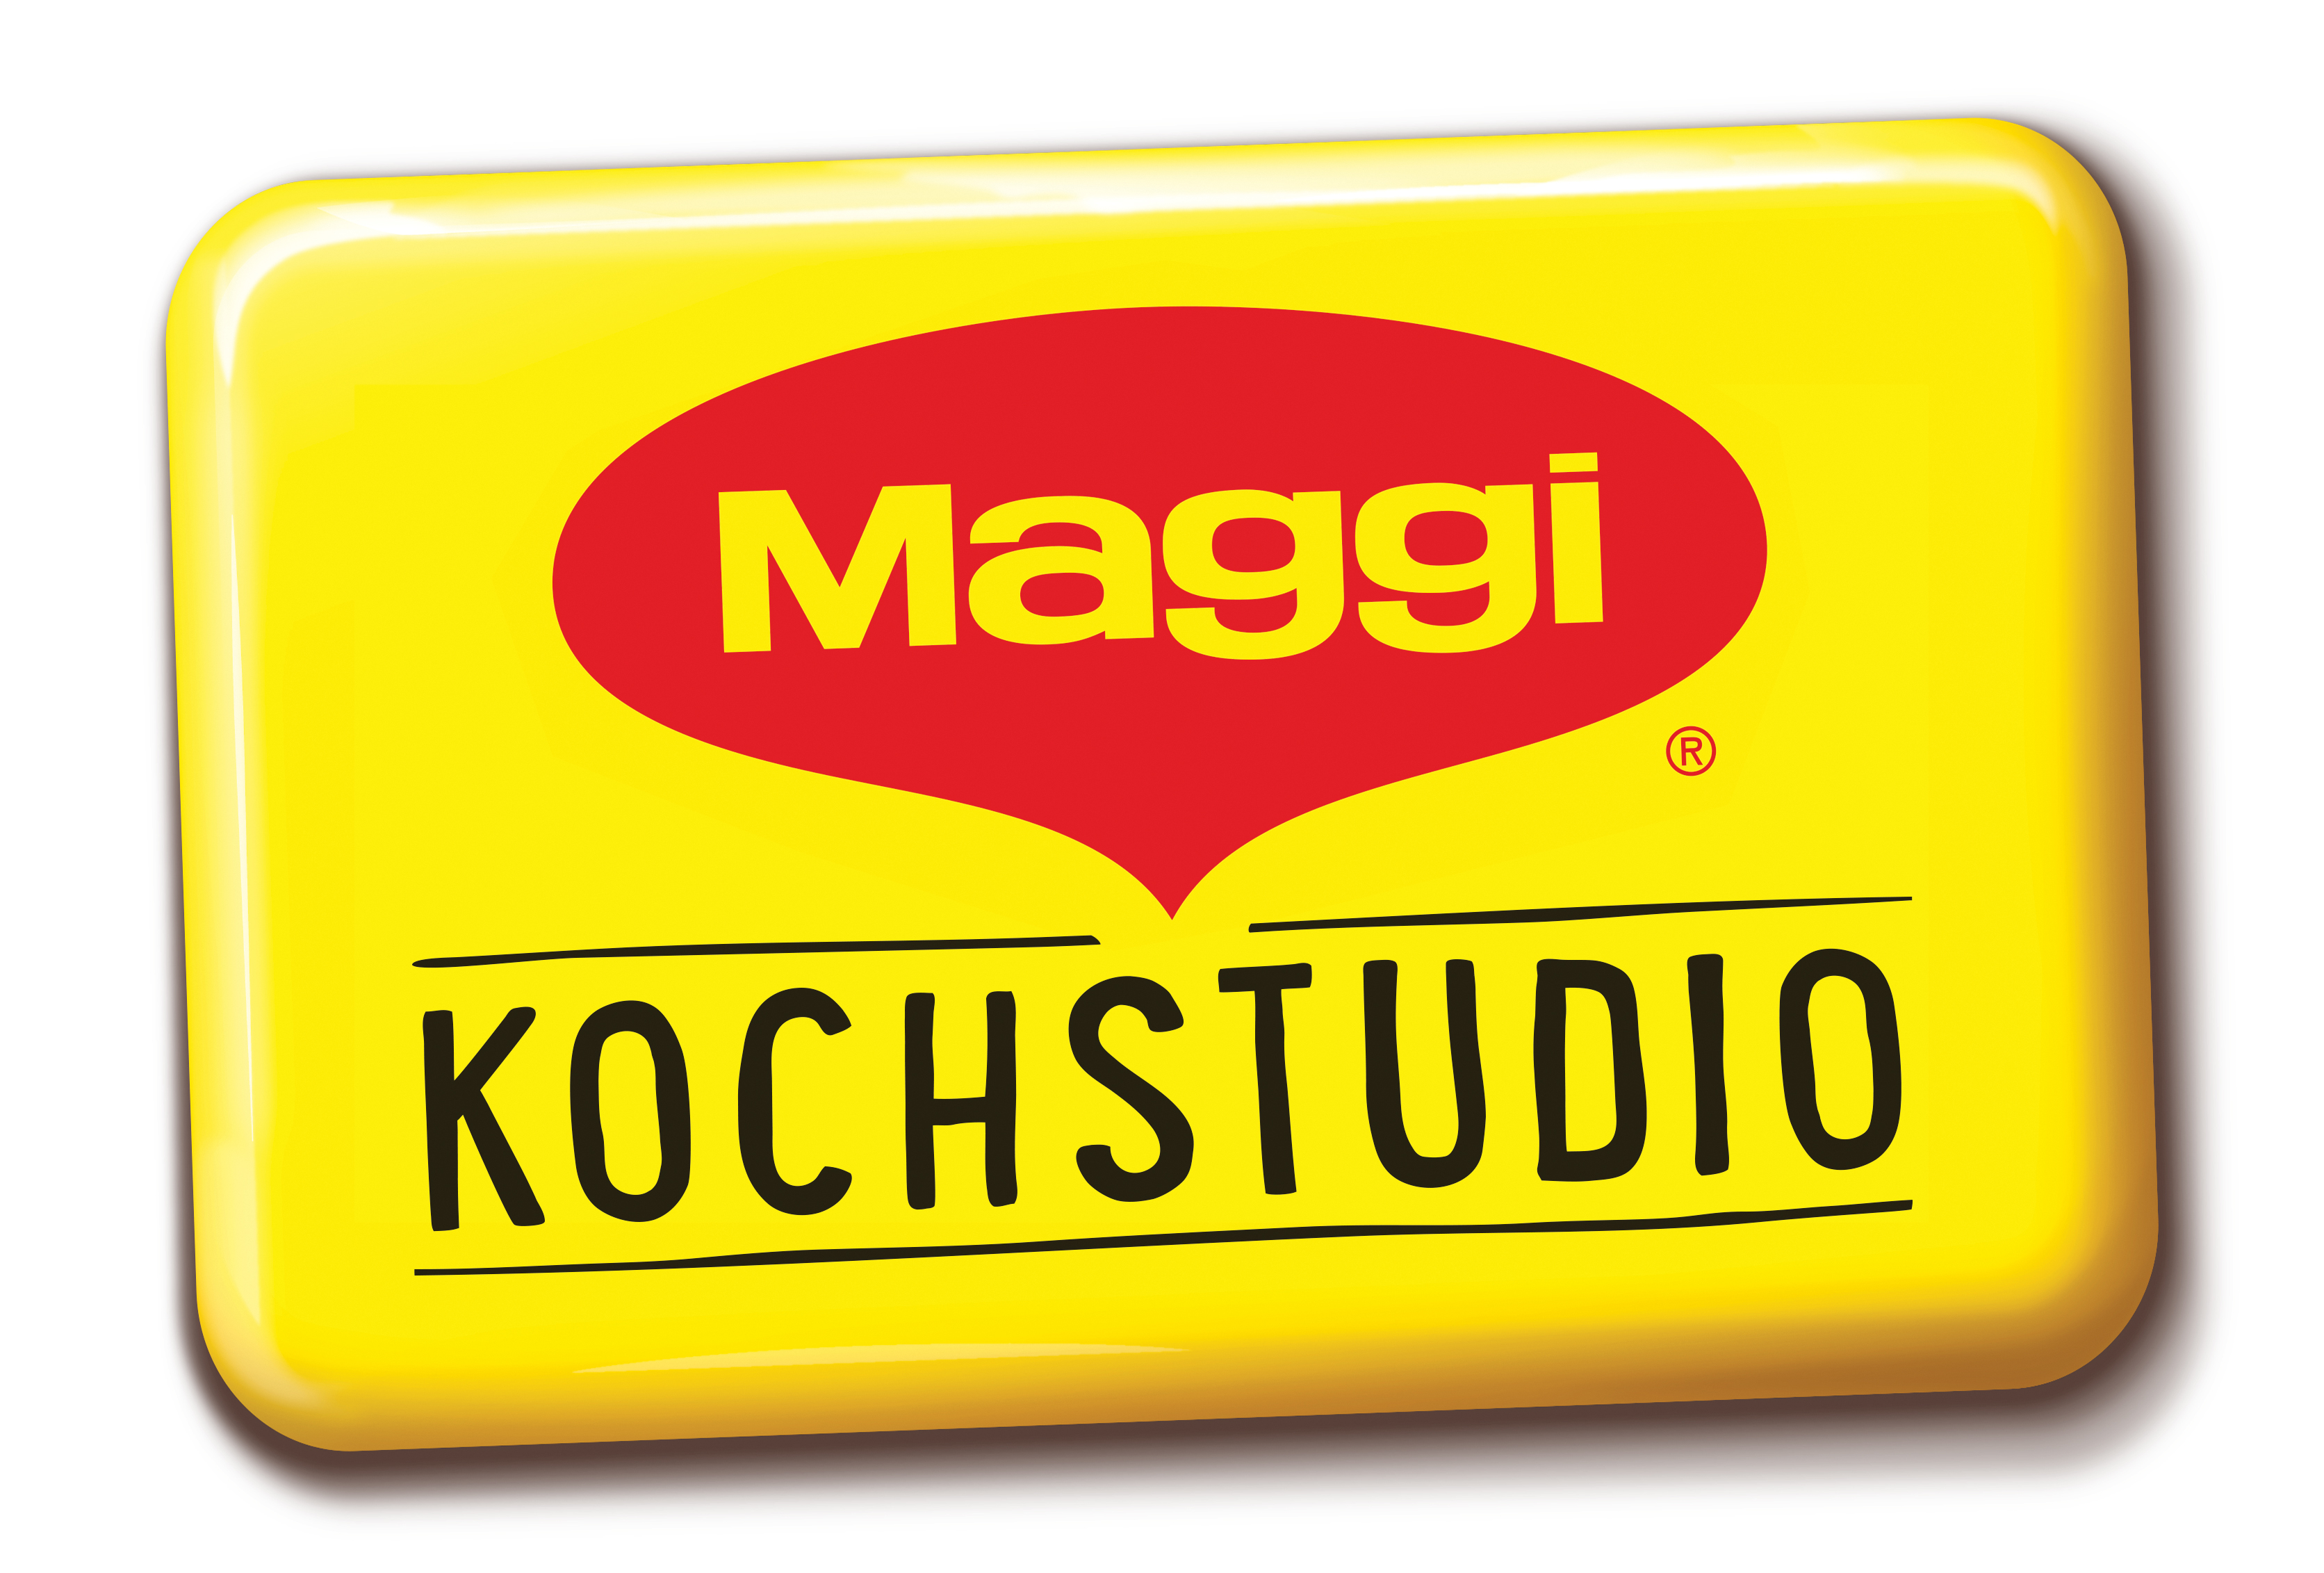 Maggi_Brandmark_Y-7533C-485C